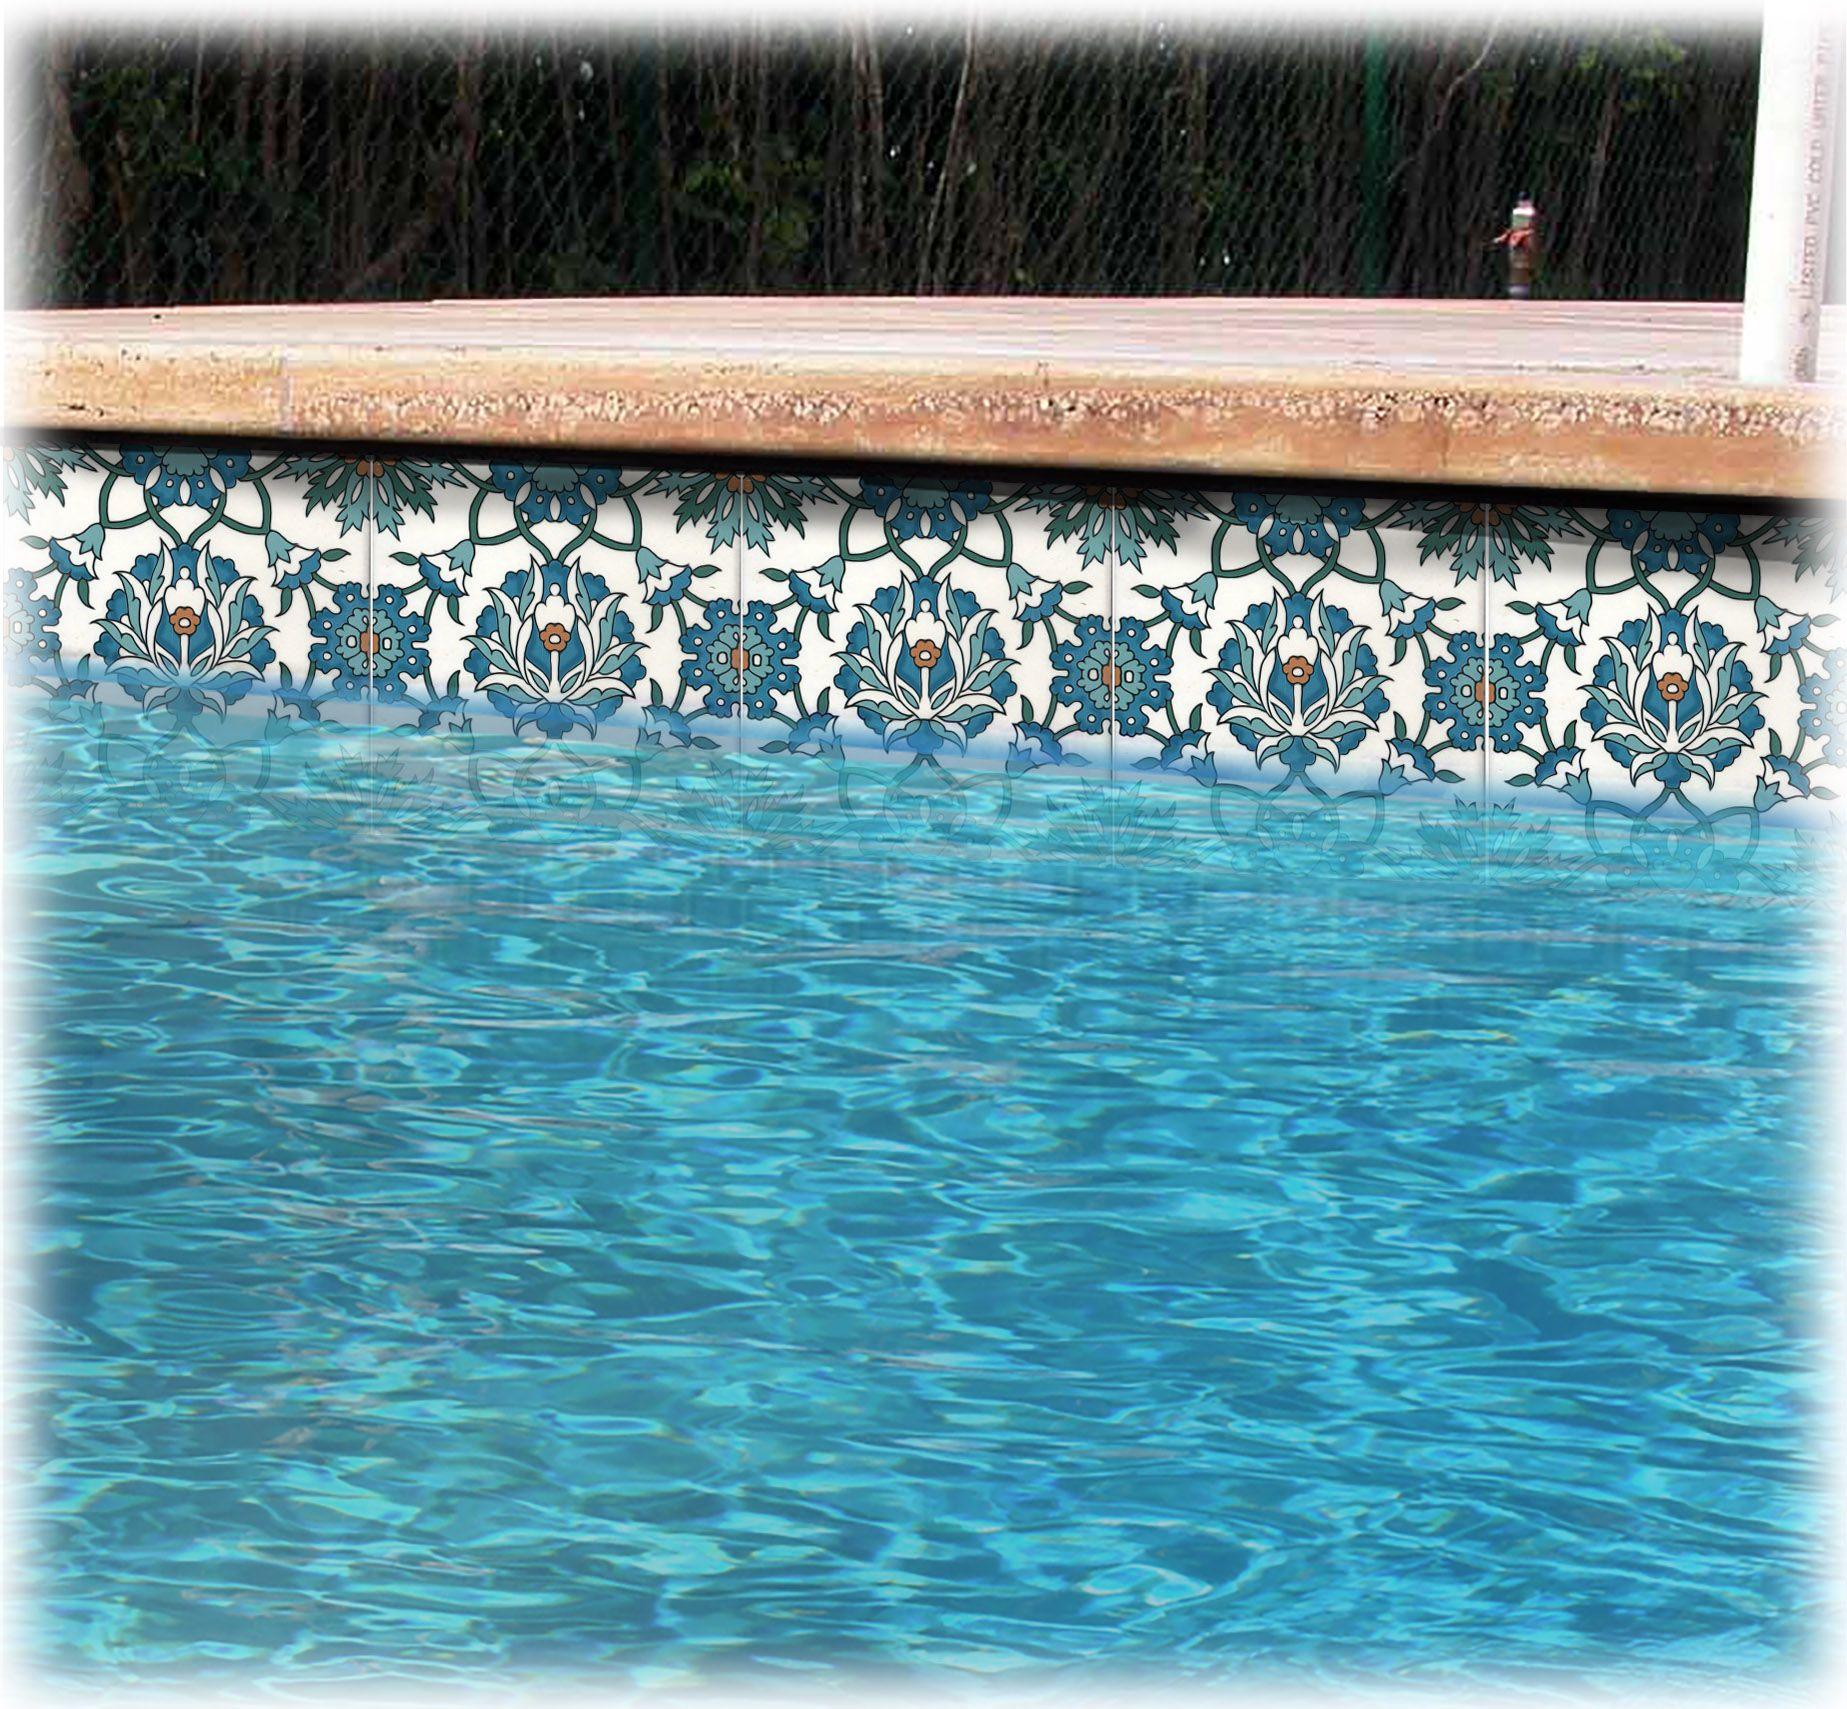 Lori Swimming Pool Tile Design Jpg 1847 1709 Waterline Pool Tile Swimming Pool Tiles Pool Tile Designs